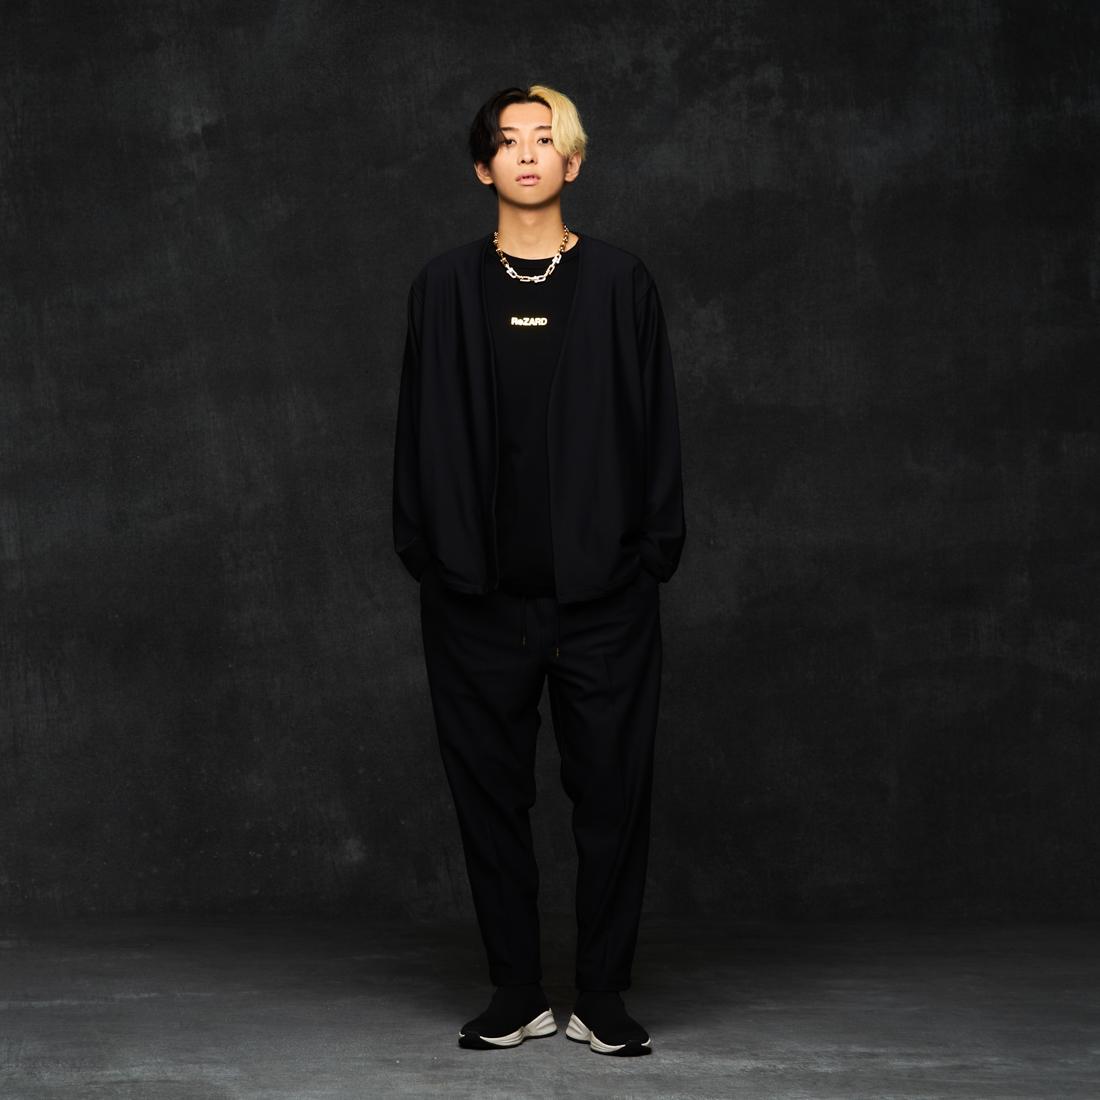 【ReZARD】SETUP No collar Jacket/Cropped Trousers